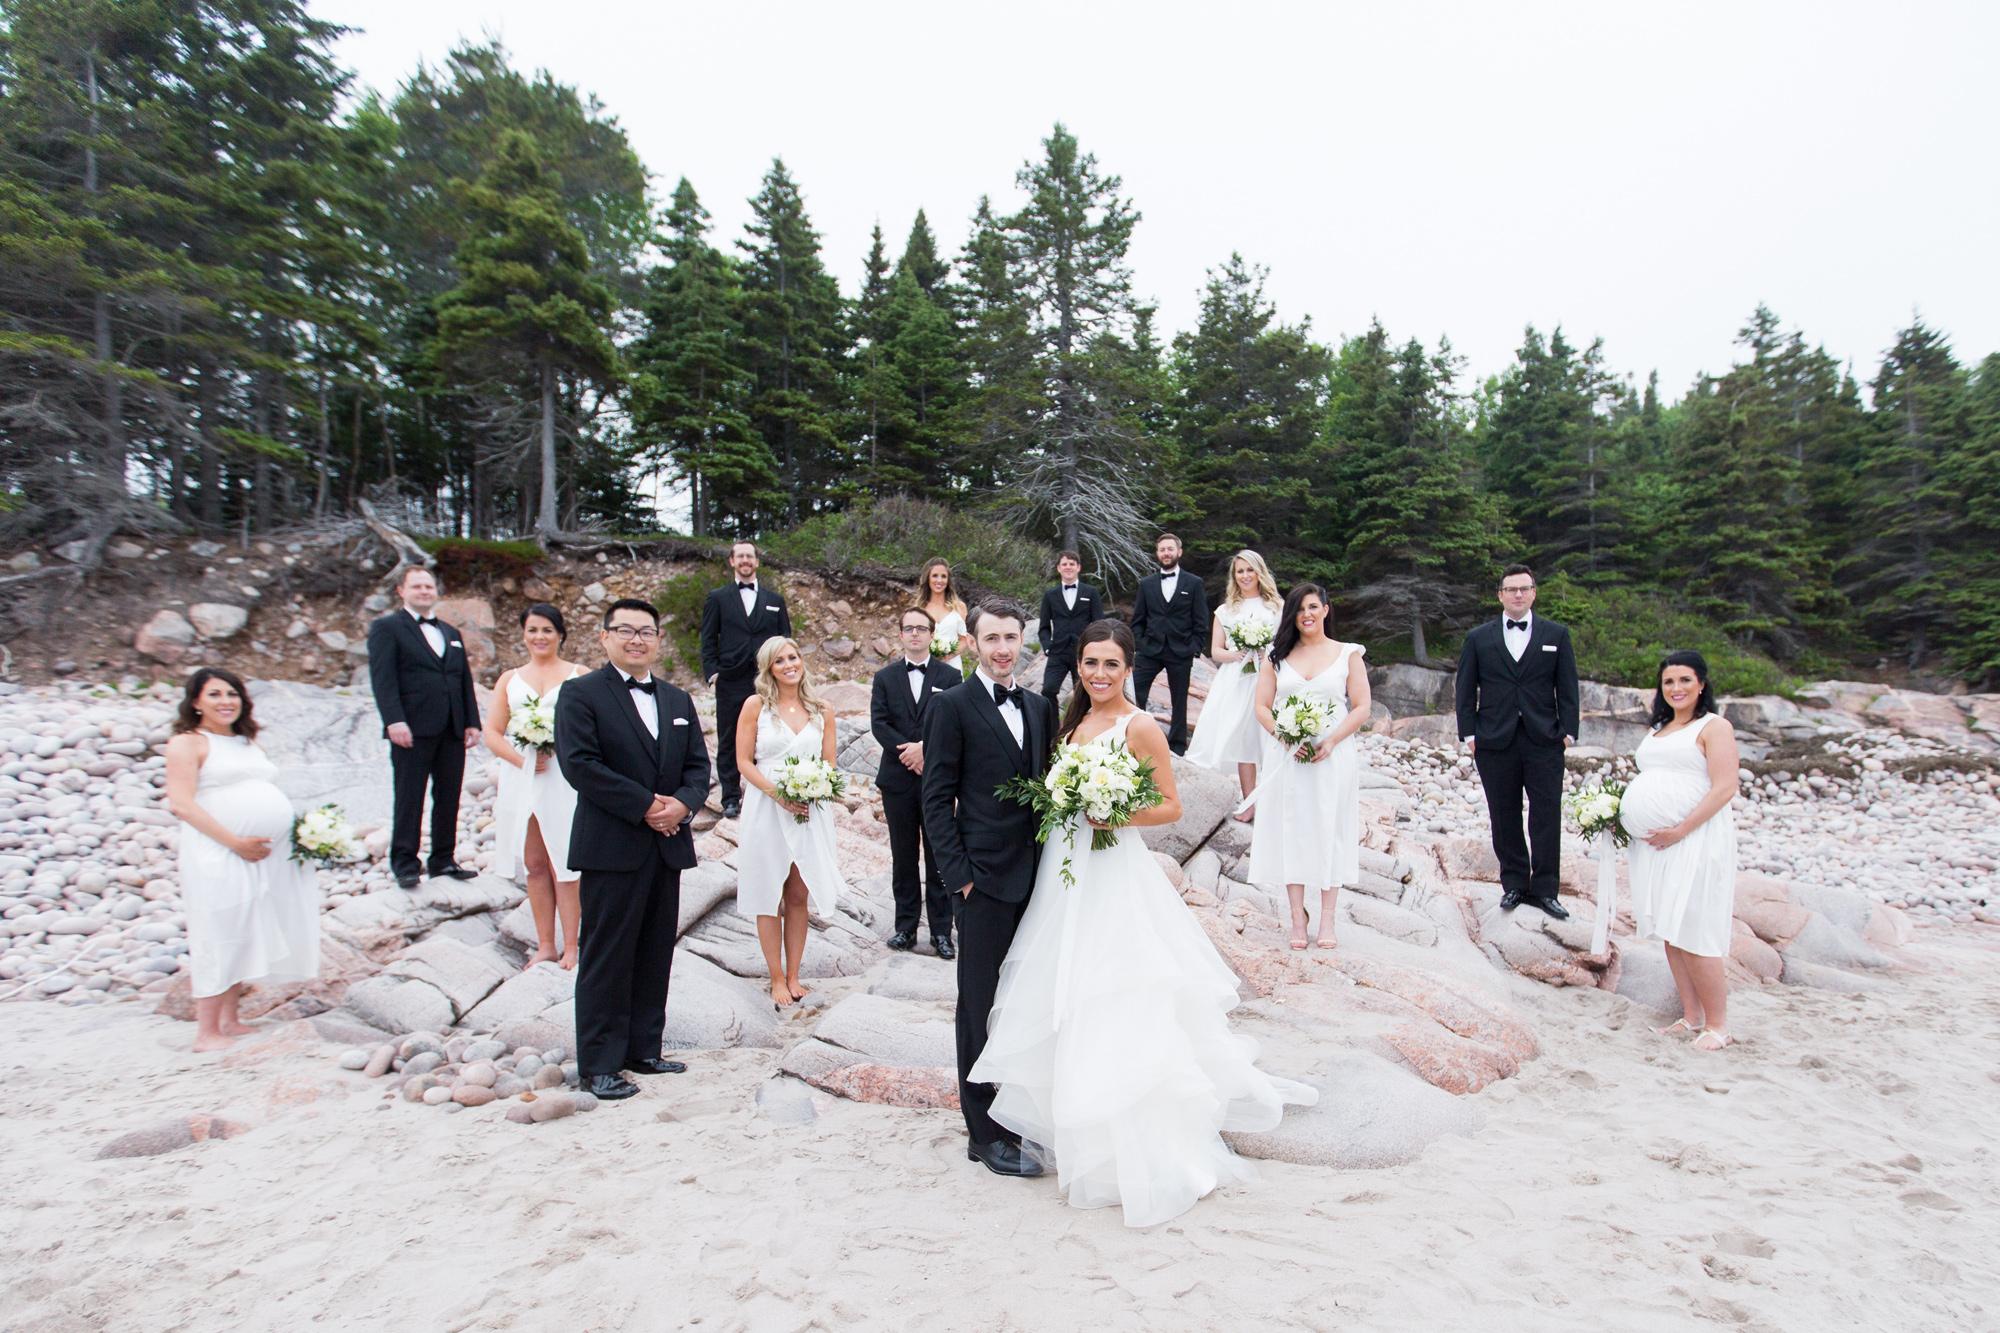 457-halifax-adventure-wedding.jpg